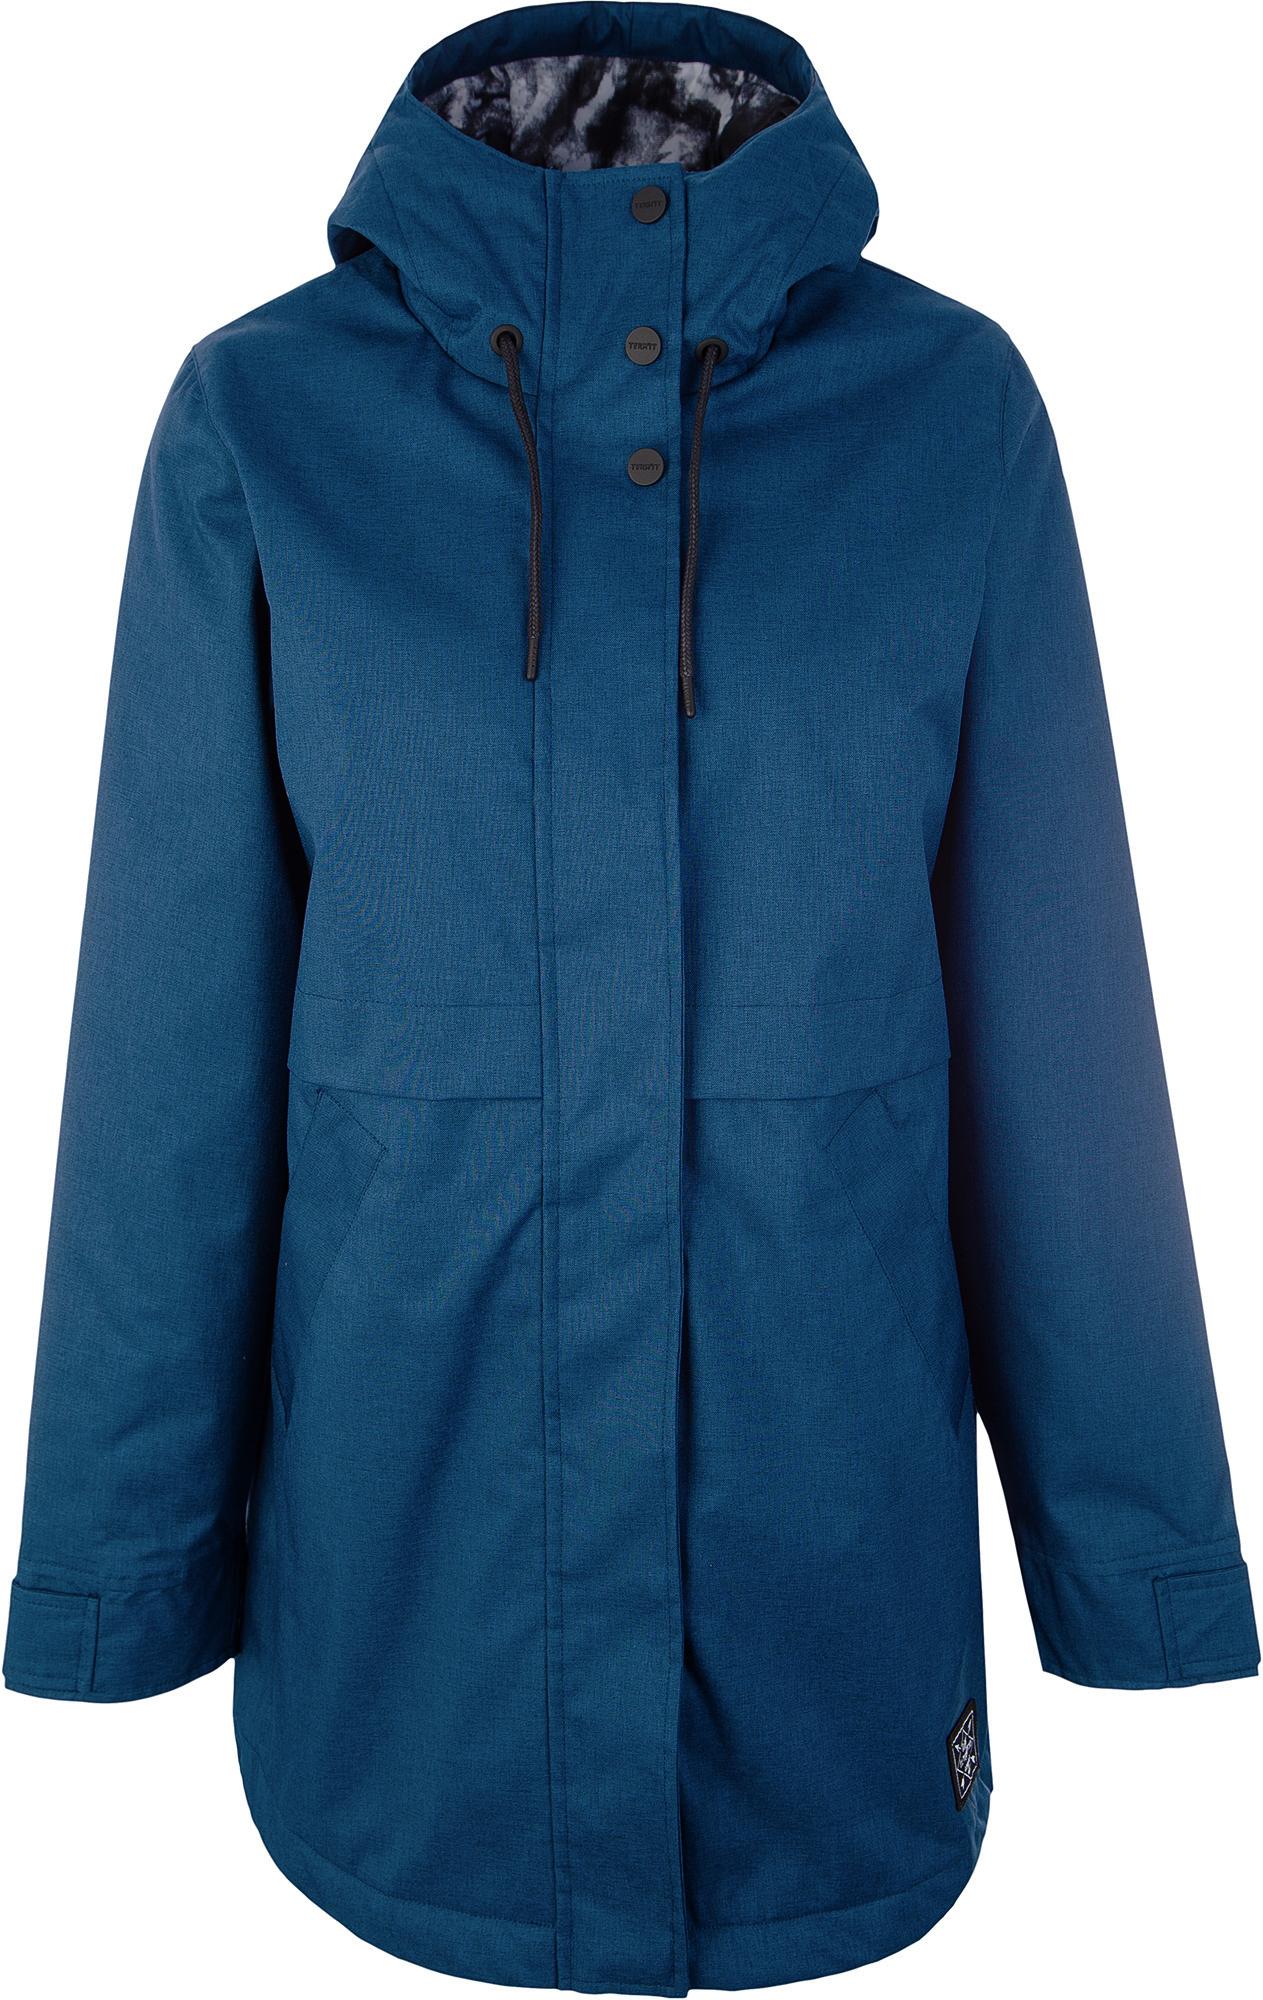 Termit Куртка утепленная женская Termit, размер 50 цена